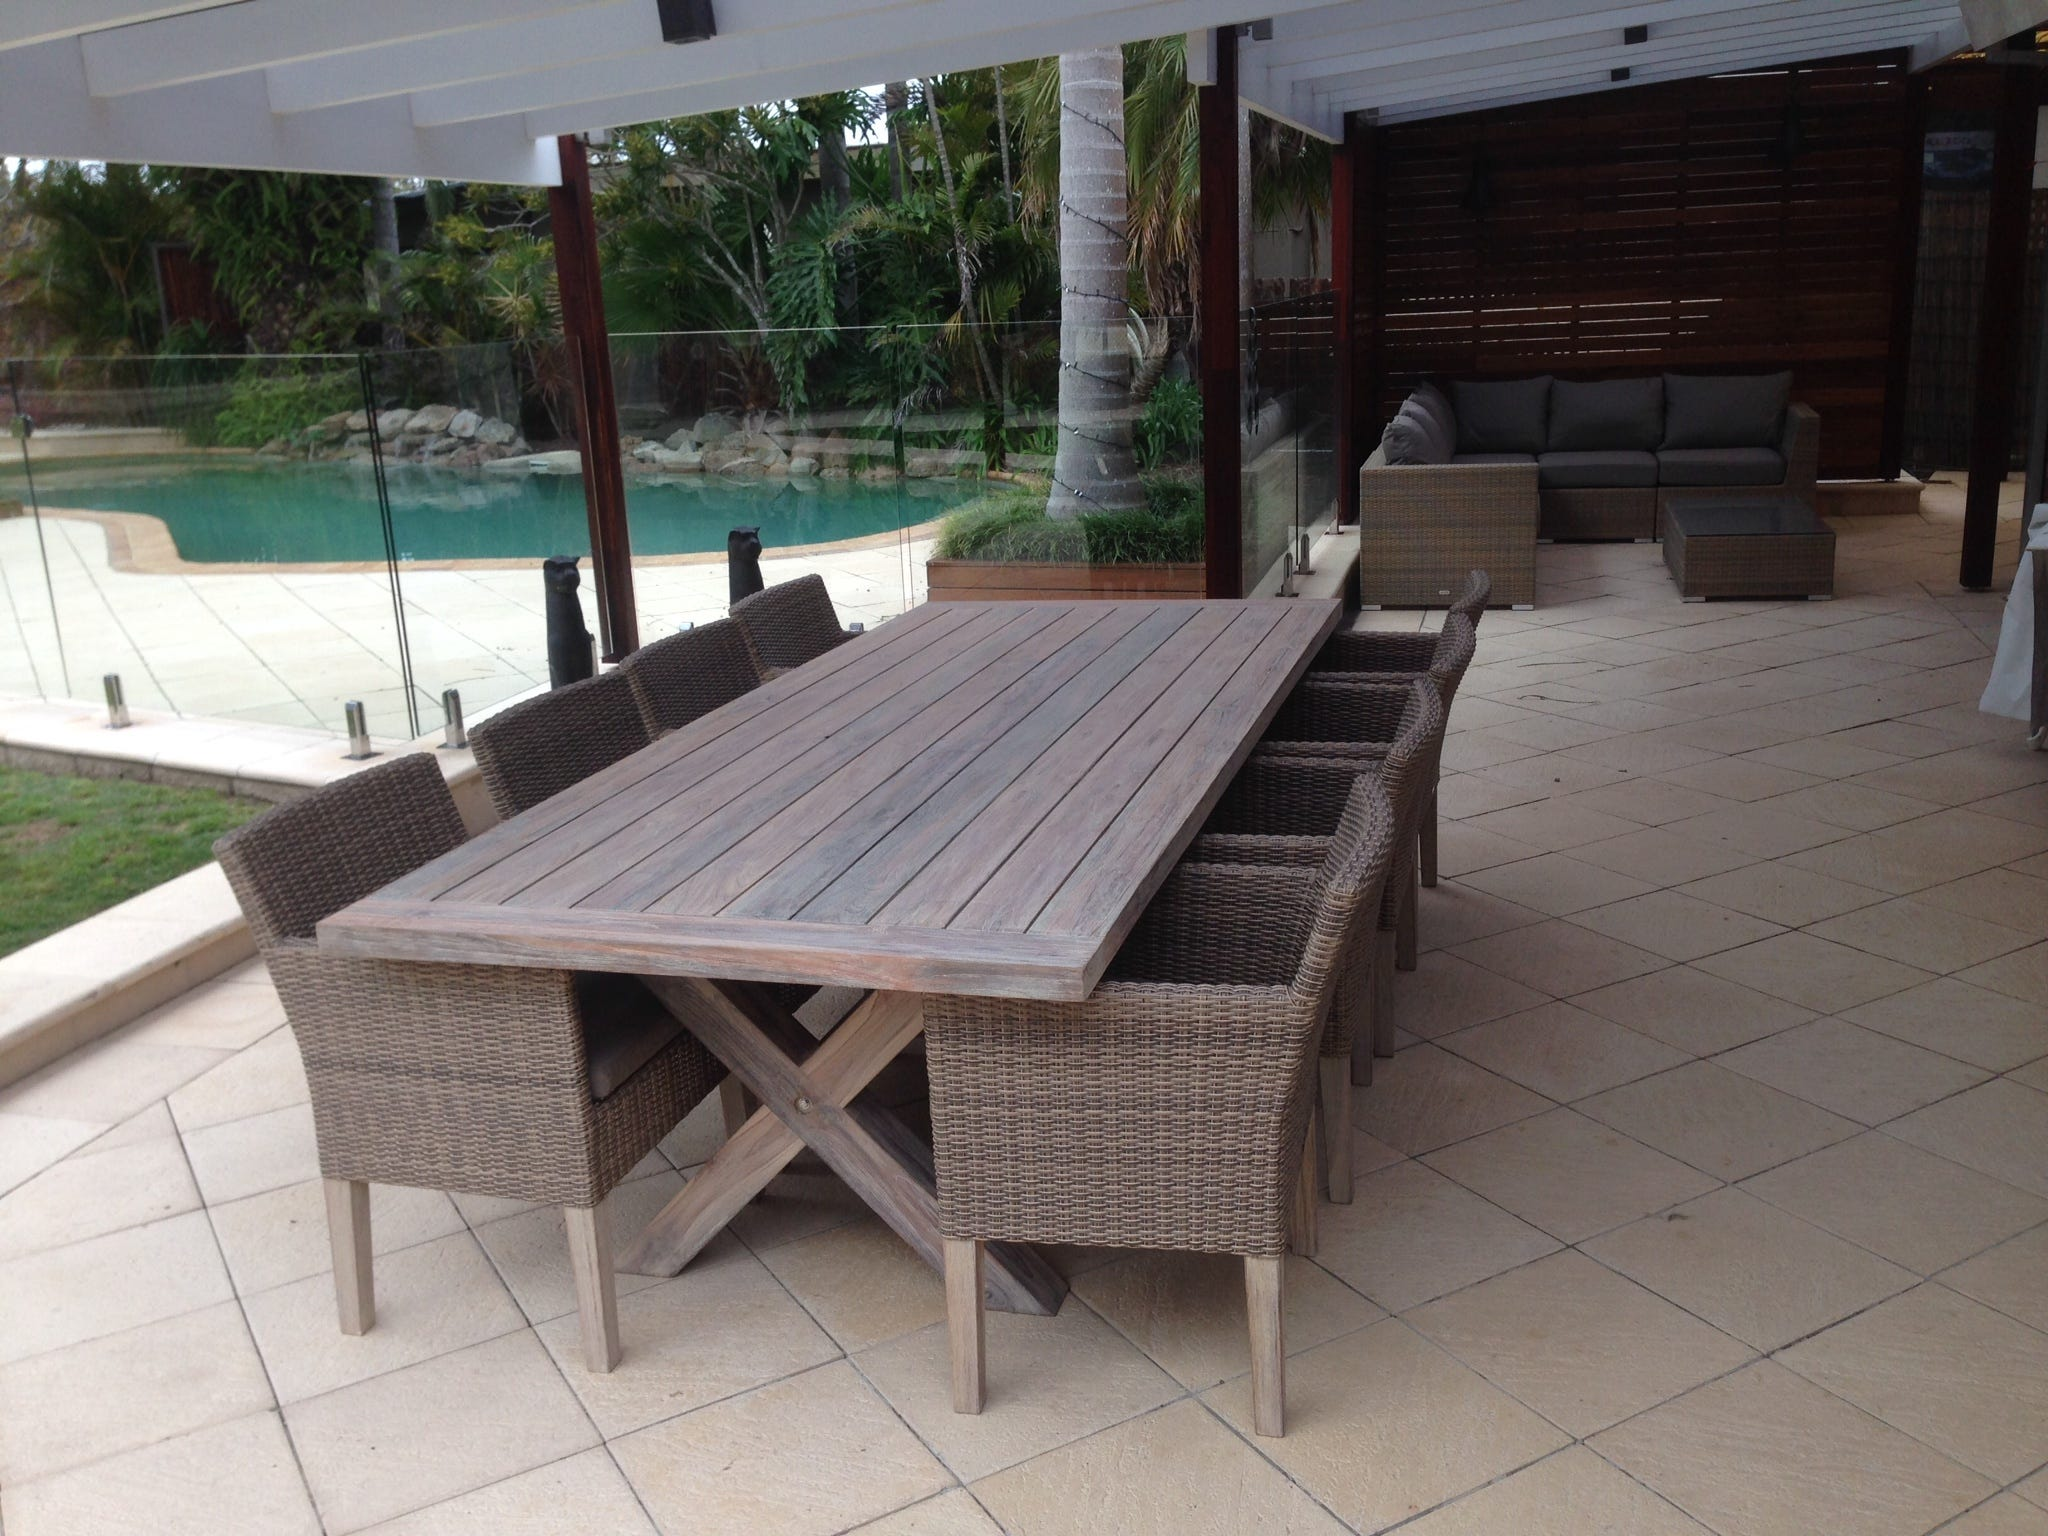 greywash teak rh outdoorelegance com au whitewashed outdoor furniture whitewashed wicker outdoor furniture